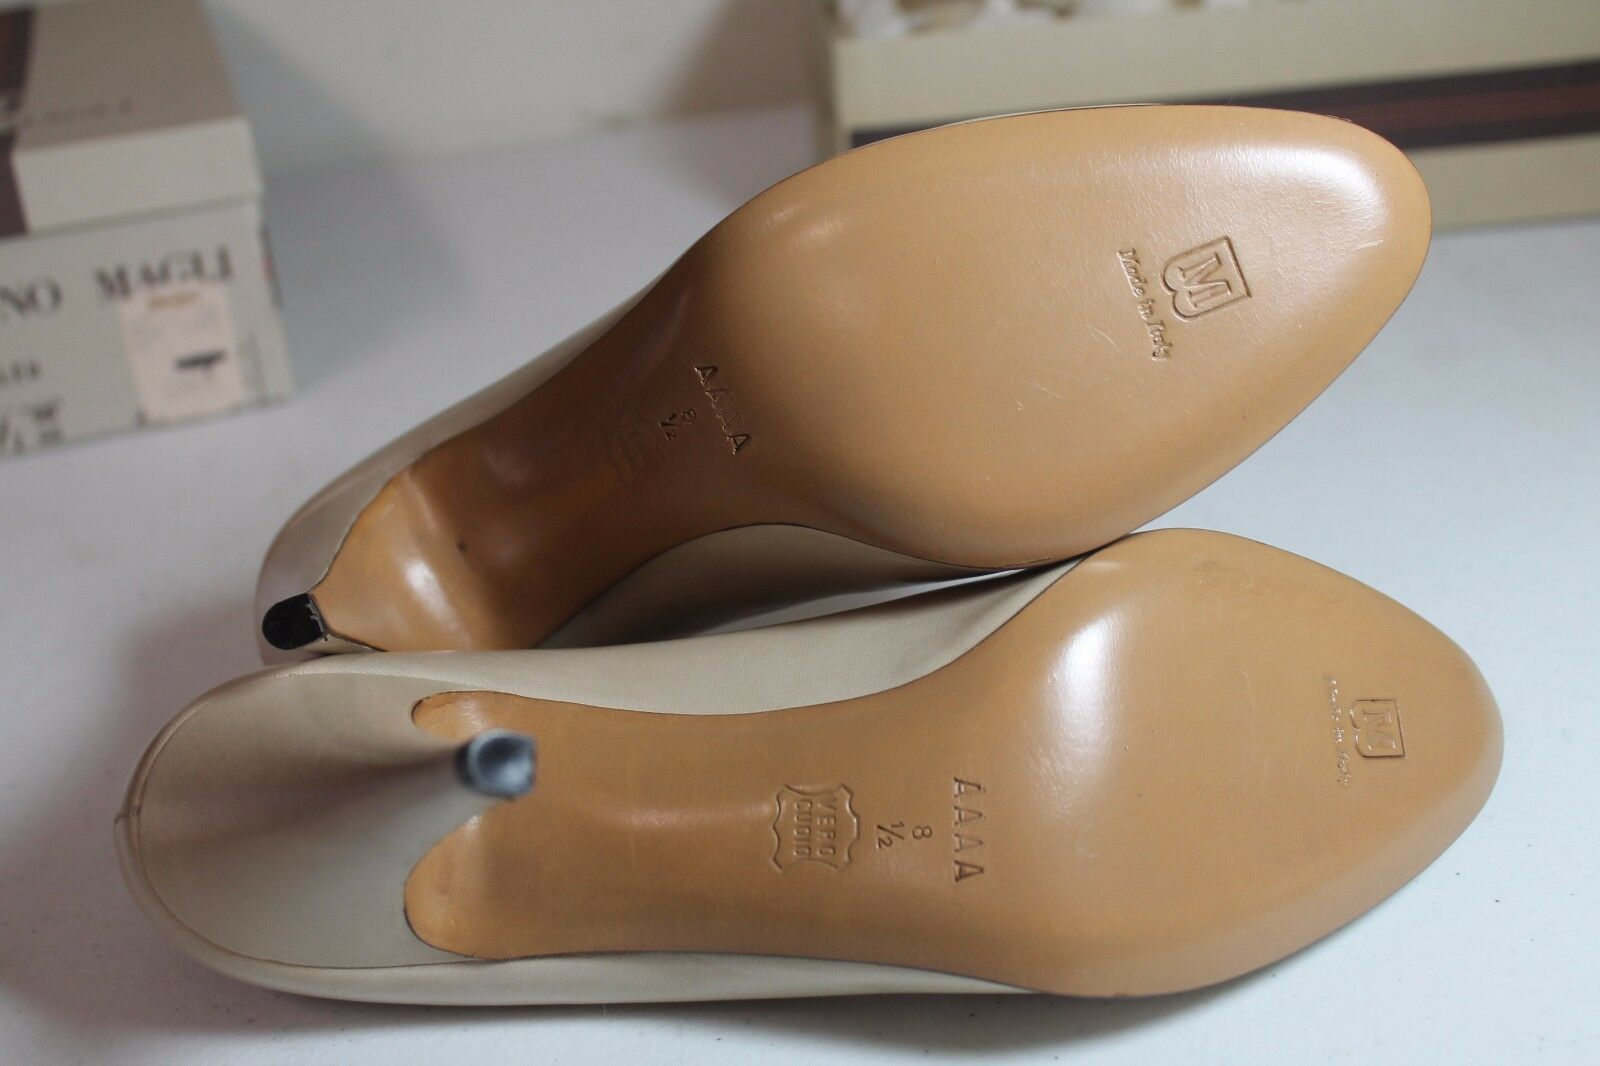 Italian Bruno Magli Bone Gilda Beige Patent Leather Open Toe Toe Toe SZ 8.5 AAAA d627b5